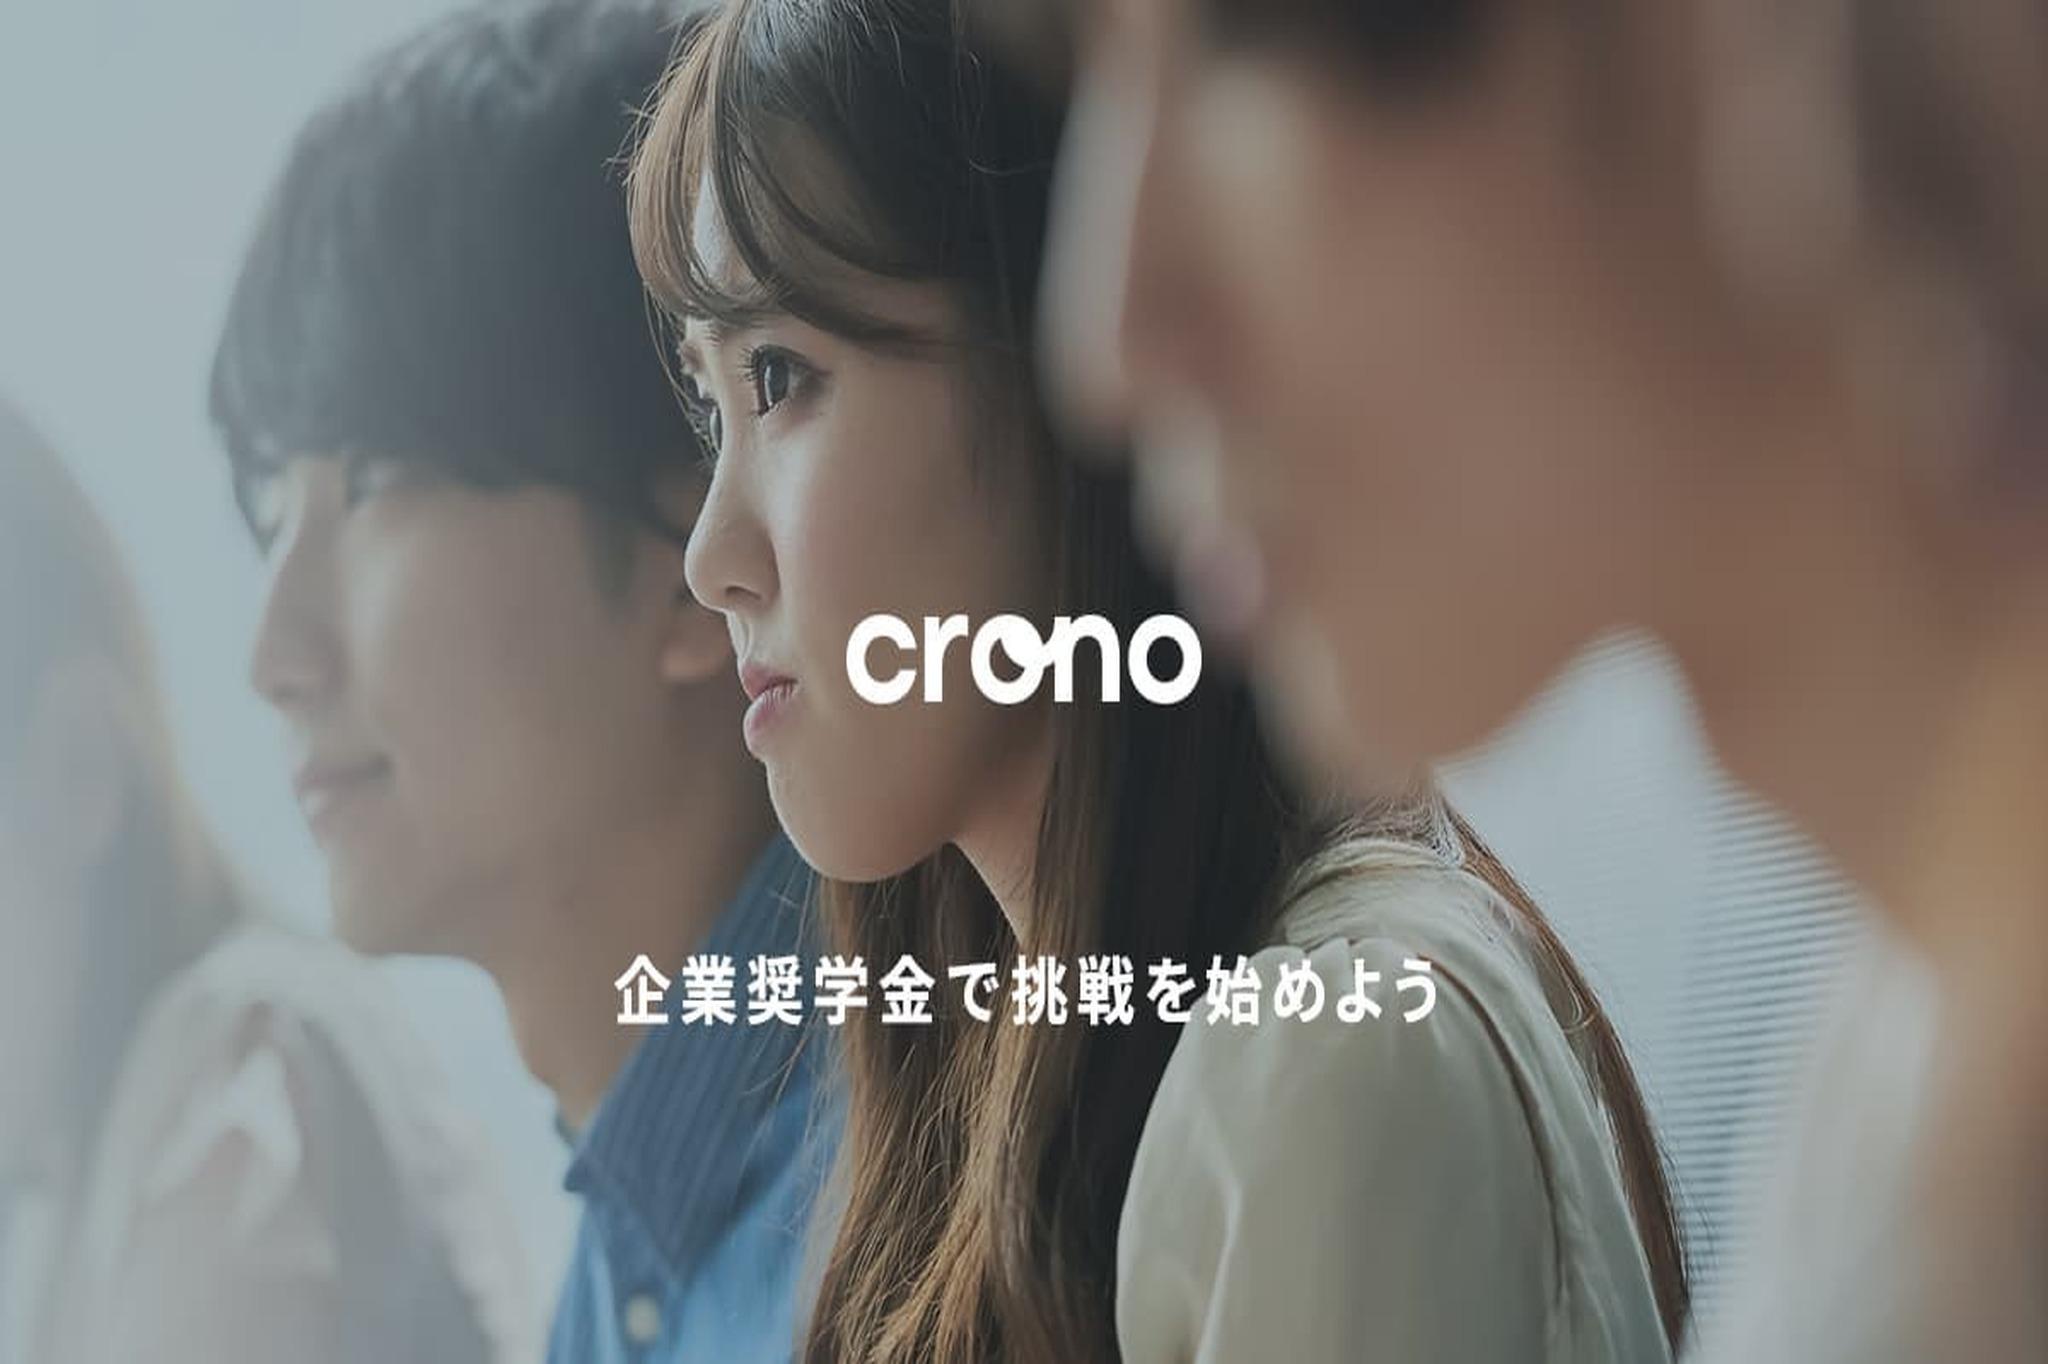 株式会社Crono